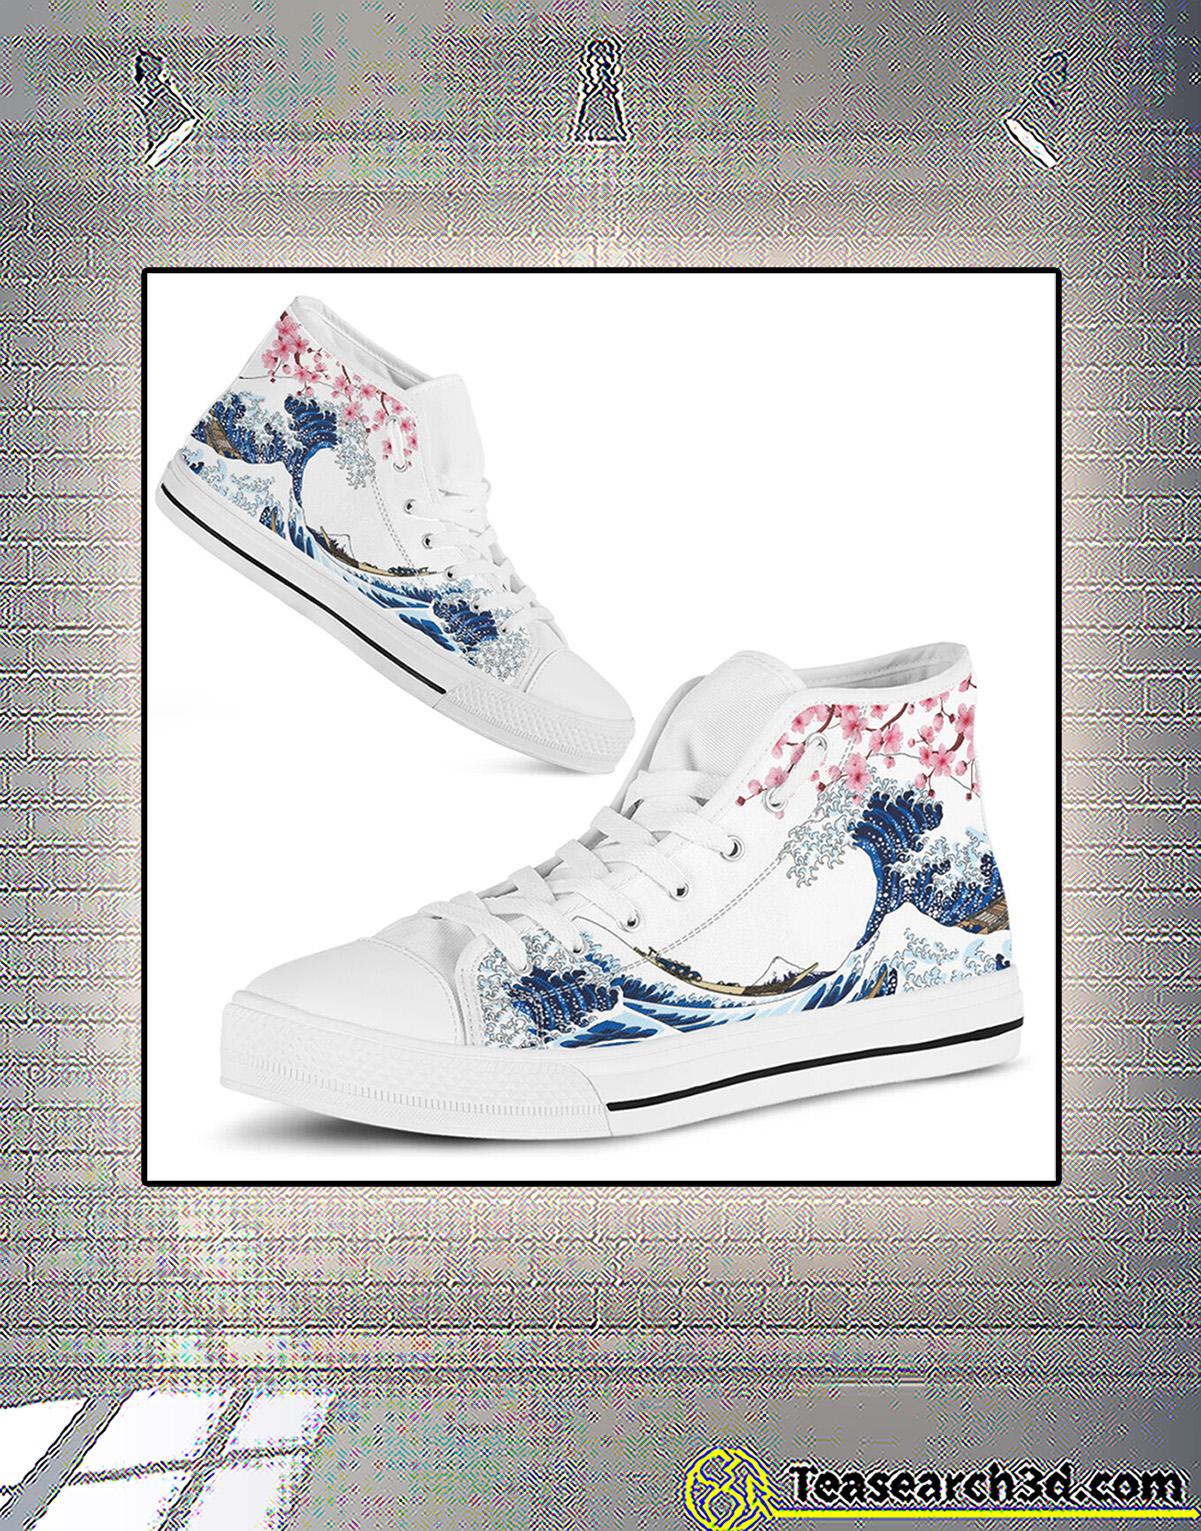 Kanagawa wave sakura cherry blossom japanese high top shoe 3